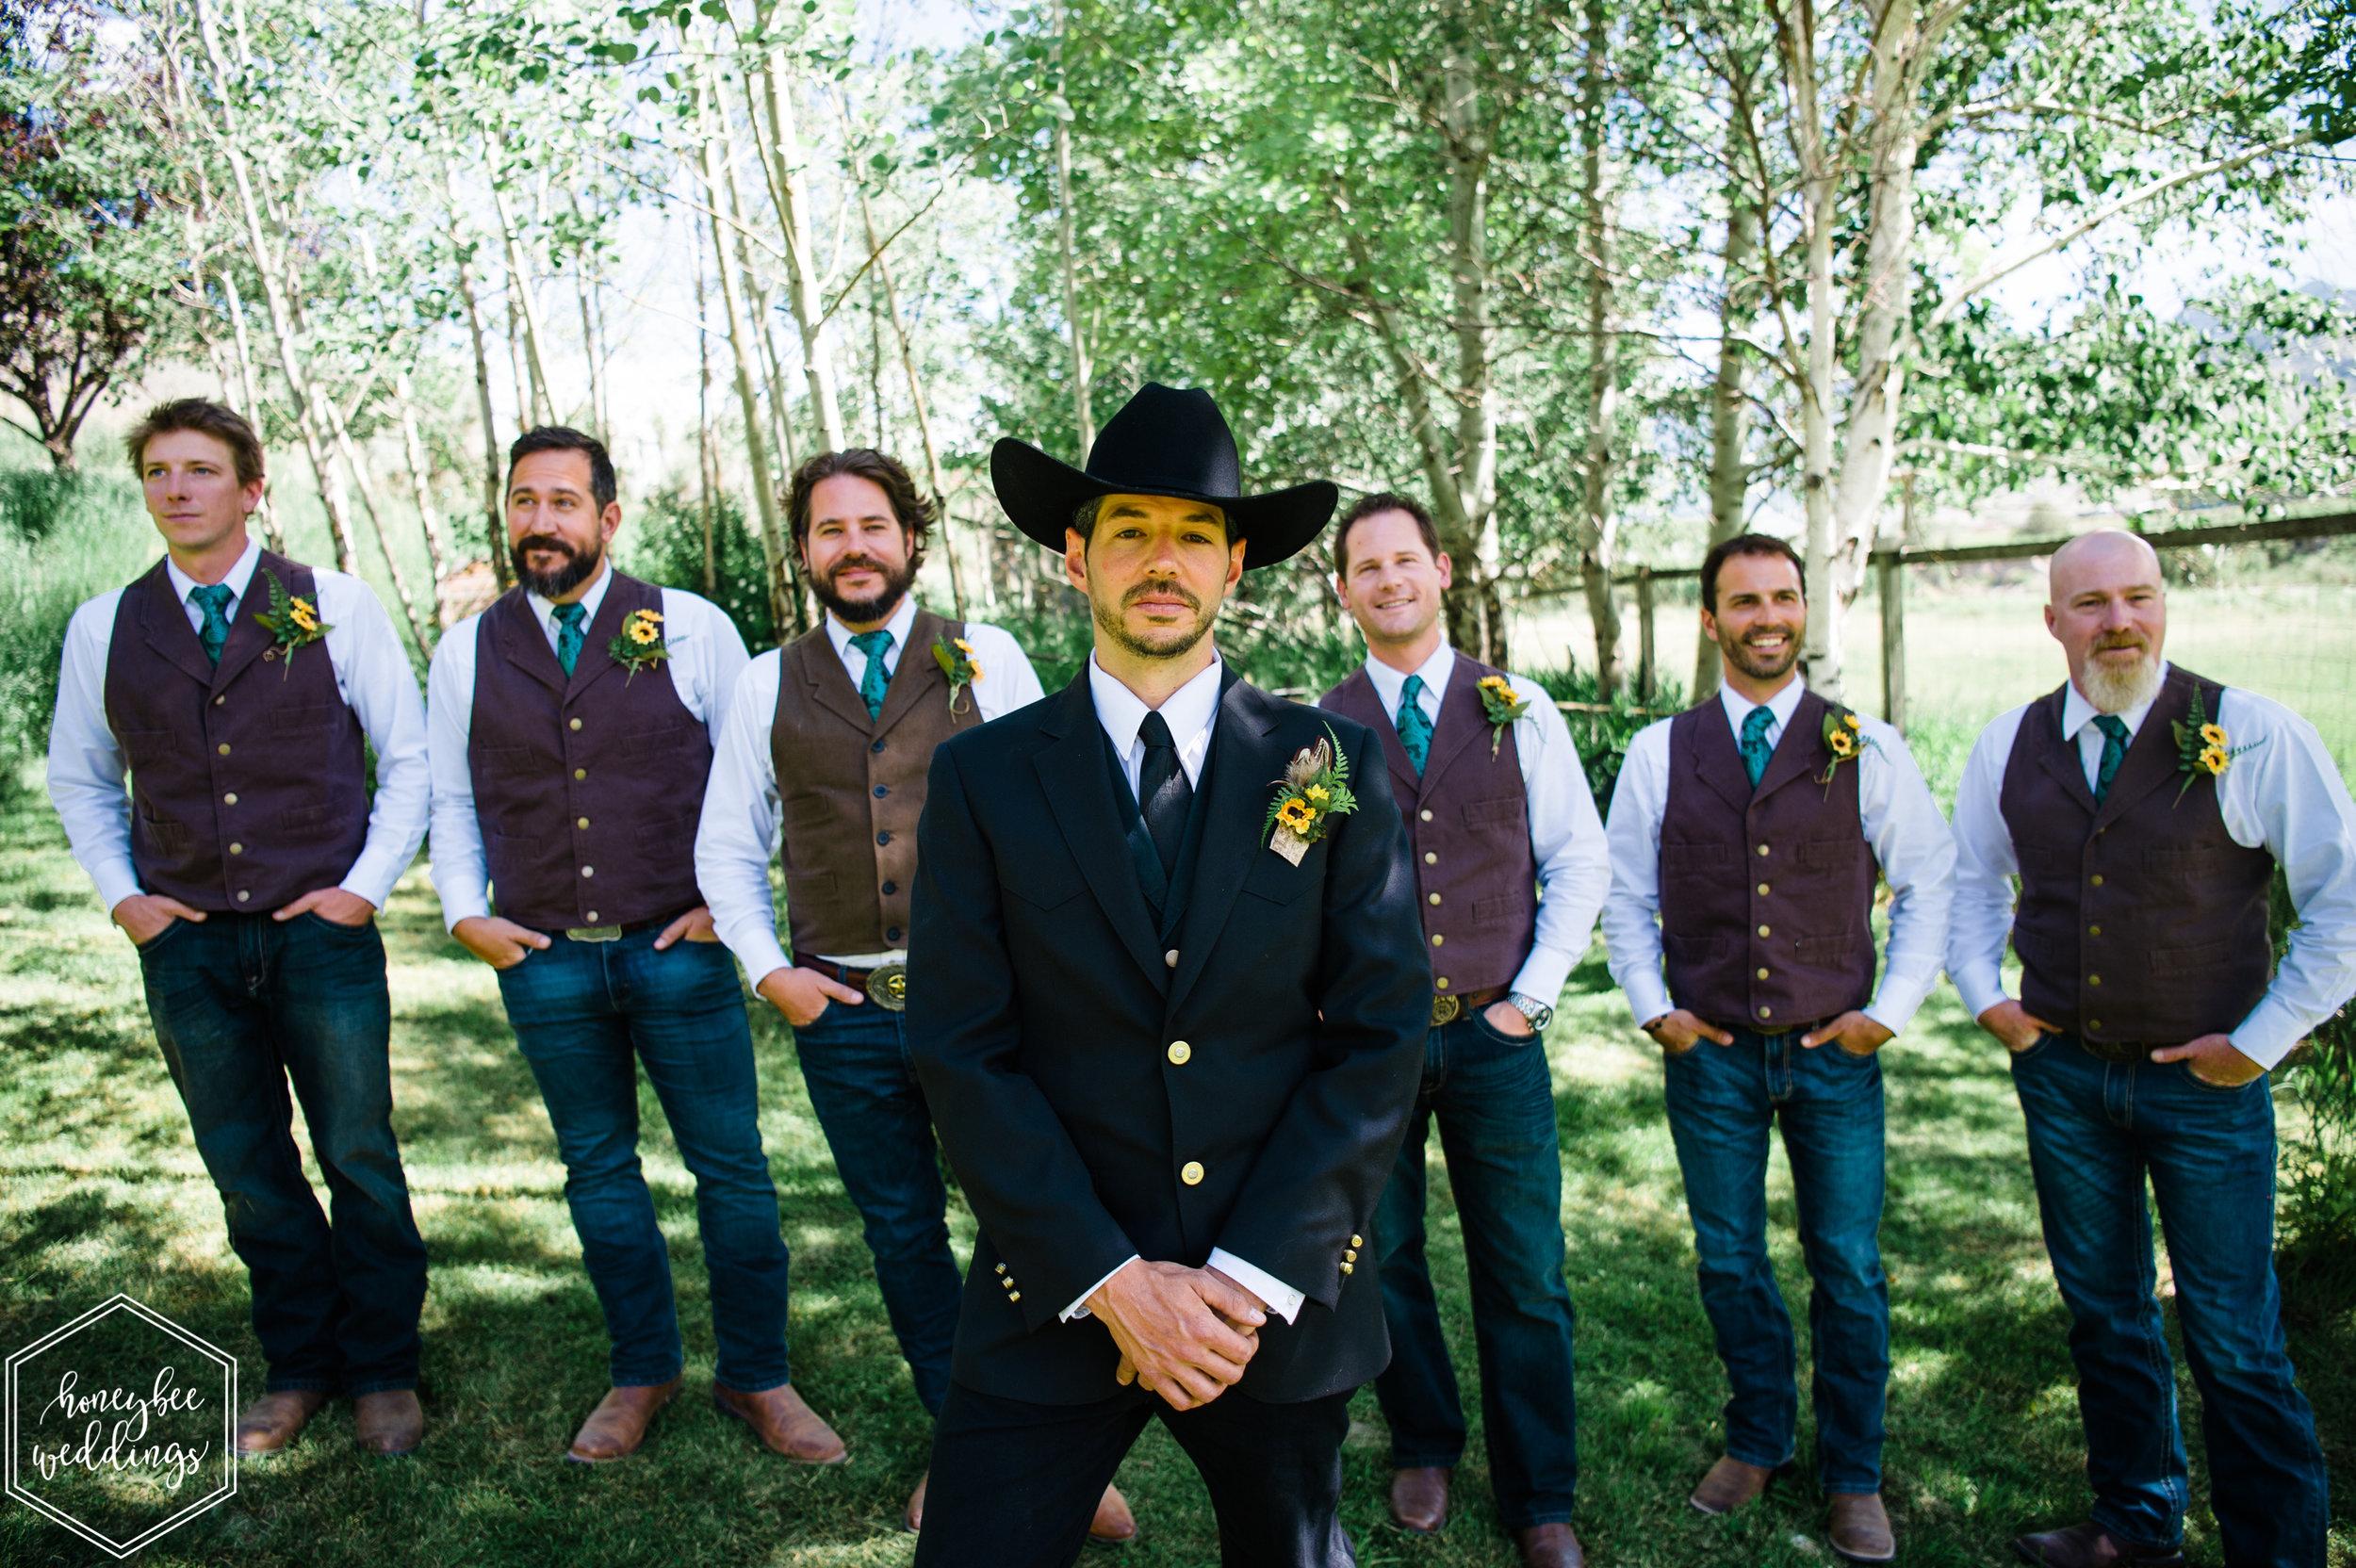 022Yellowstone National Park Wedding_Montana Wedding Photographer_Honeybee Weddings_Shannon & Jonathan_June 29, 2019-233.jpg